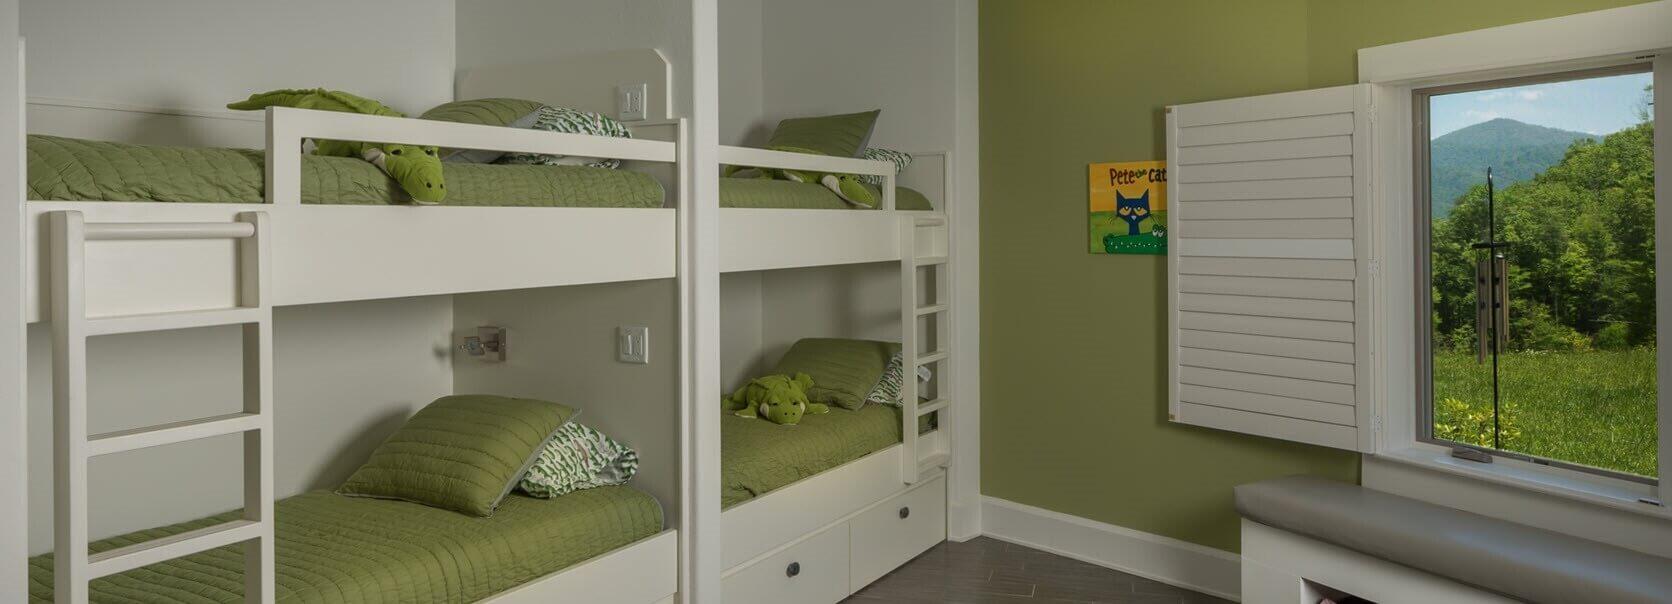 green-bunk-beds